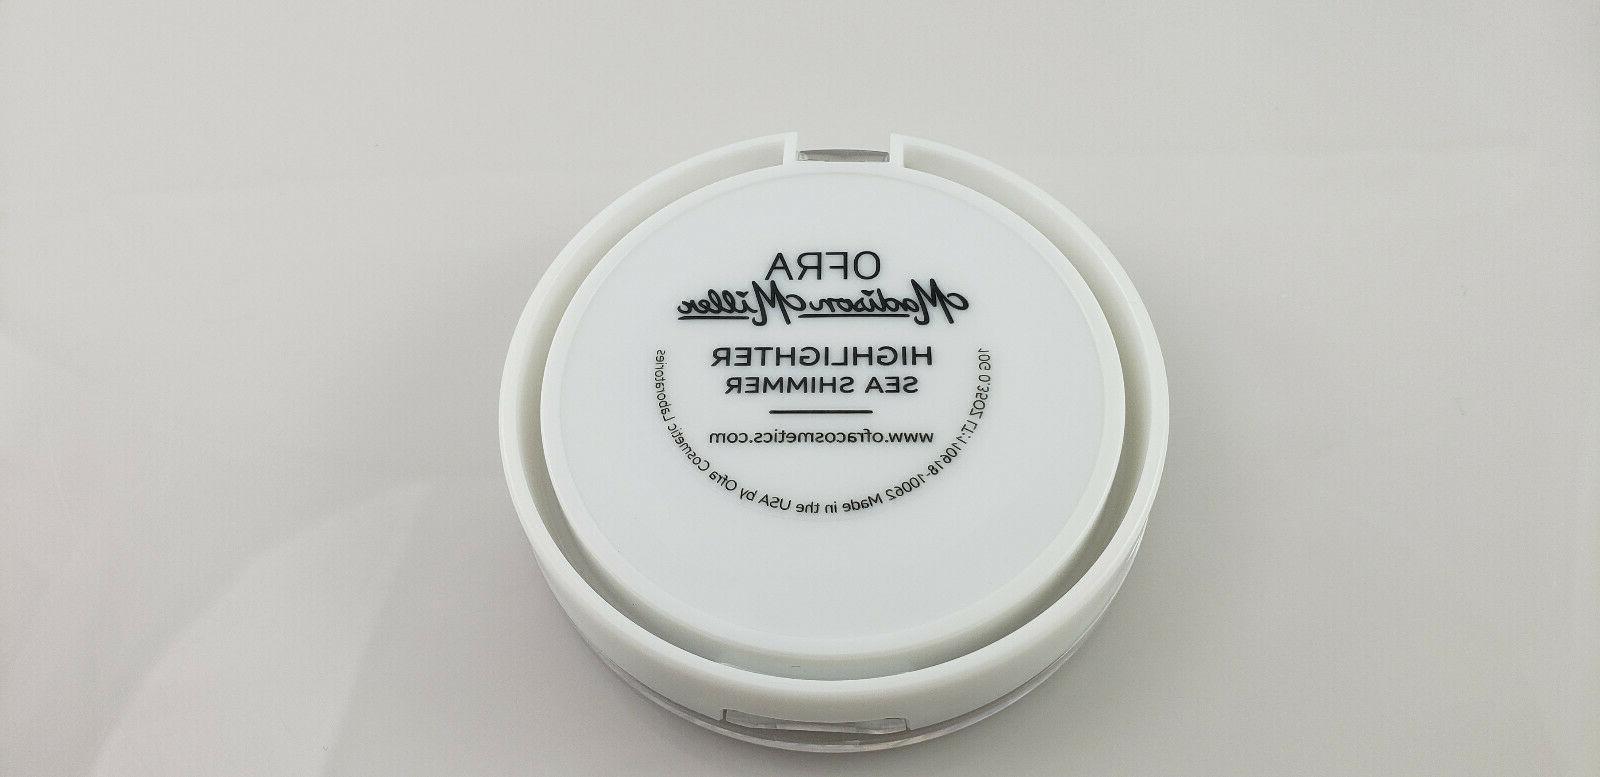 Ofra Cosmetics Highlighter Sea 10g / Full